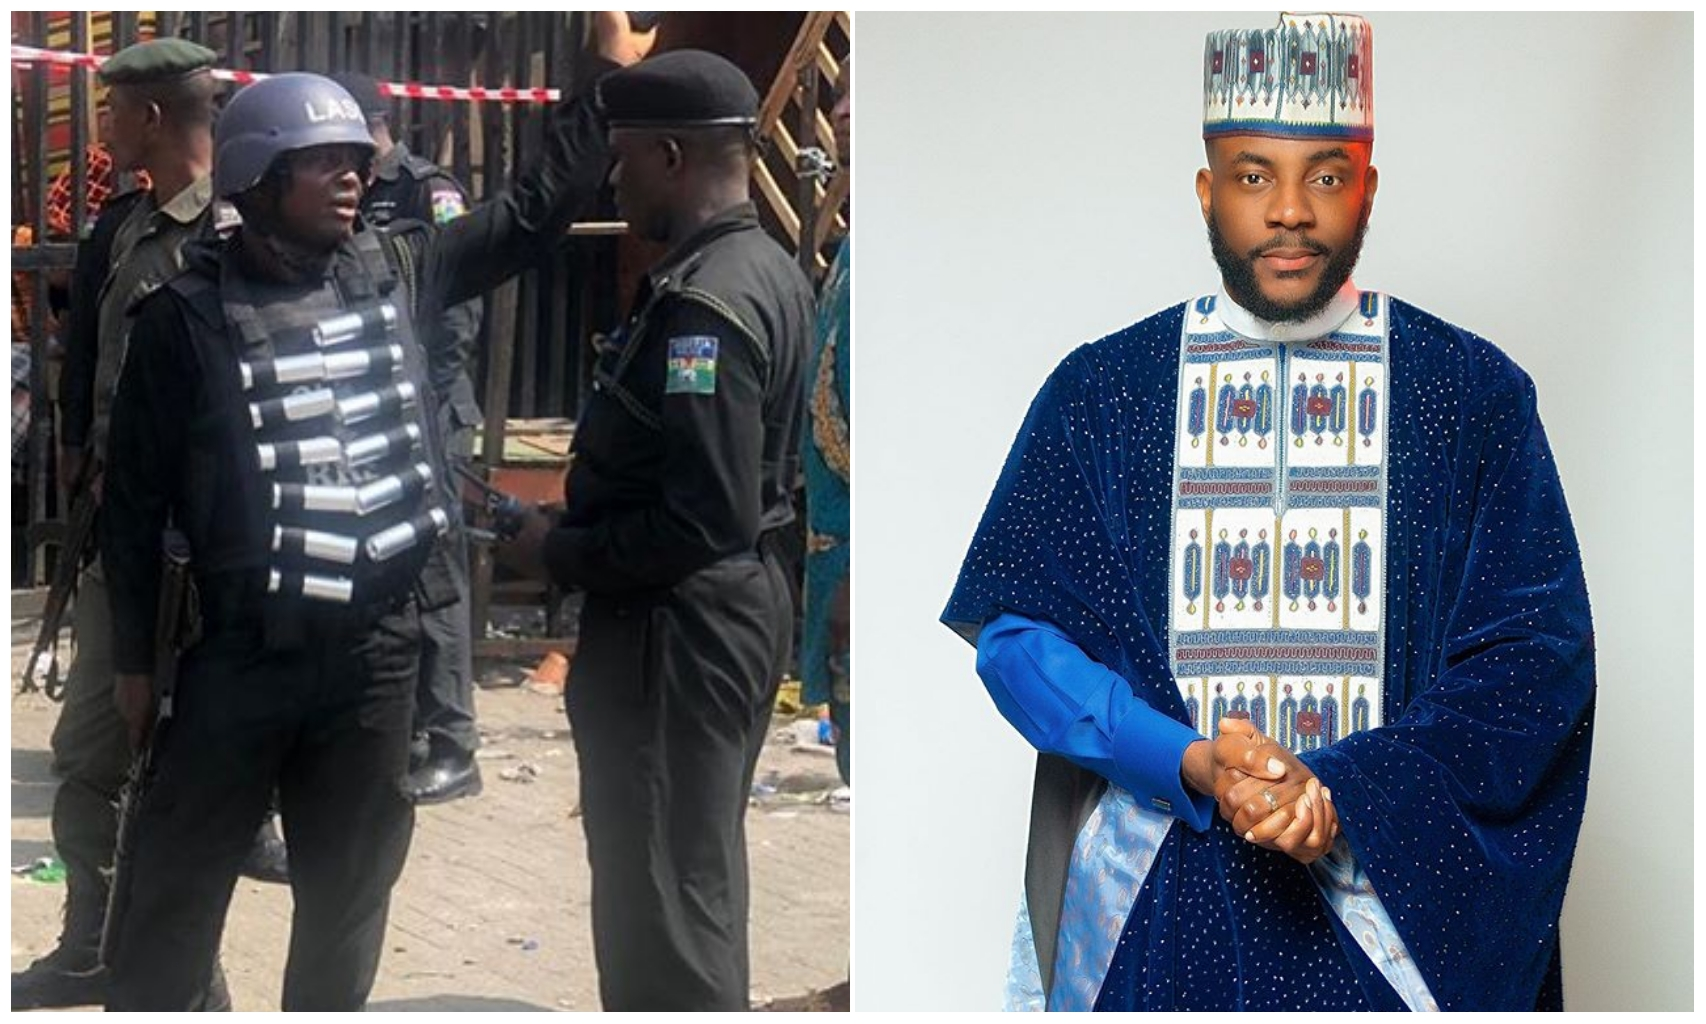 EndSars: 'A gun was pointed at me' – Ebuka narrates his ordeal with SARS operatives (Video)